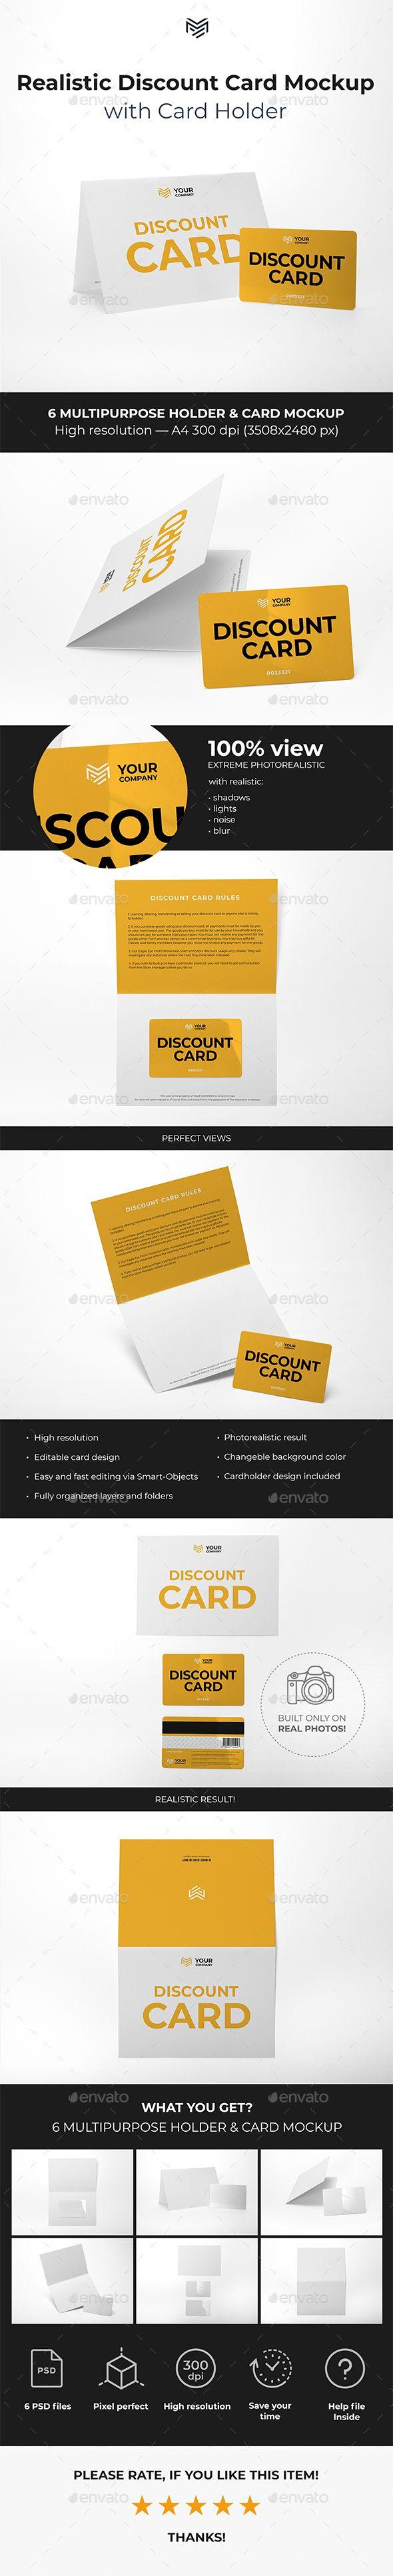 Multipurpose Card Holder Discount Card Mockup Discount Card Hotel Key Cards Best Visiting Card Designs